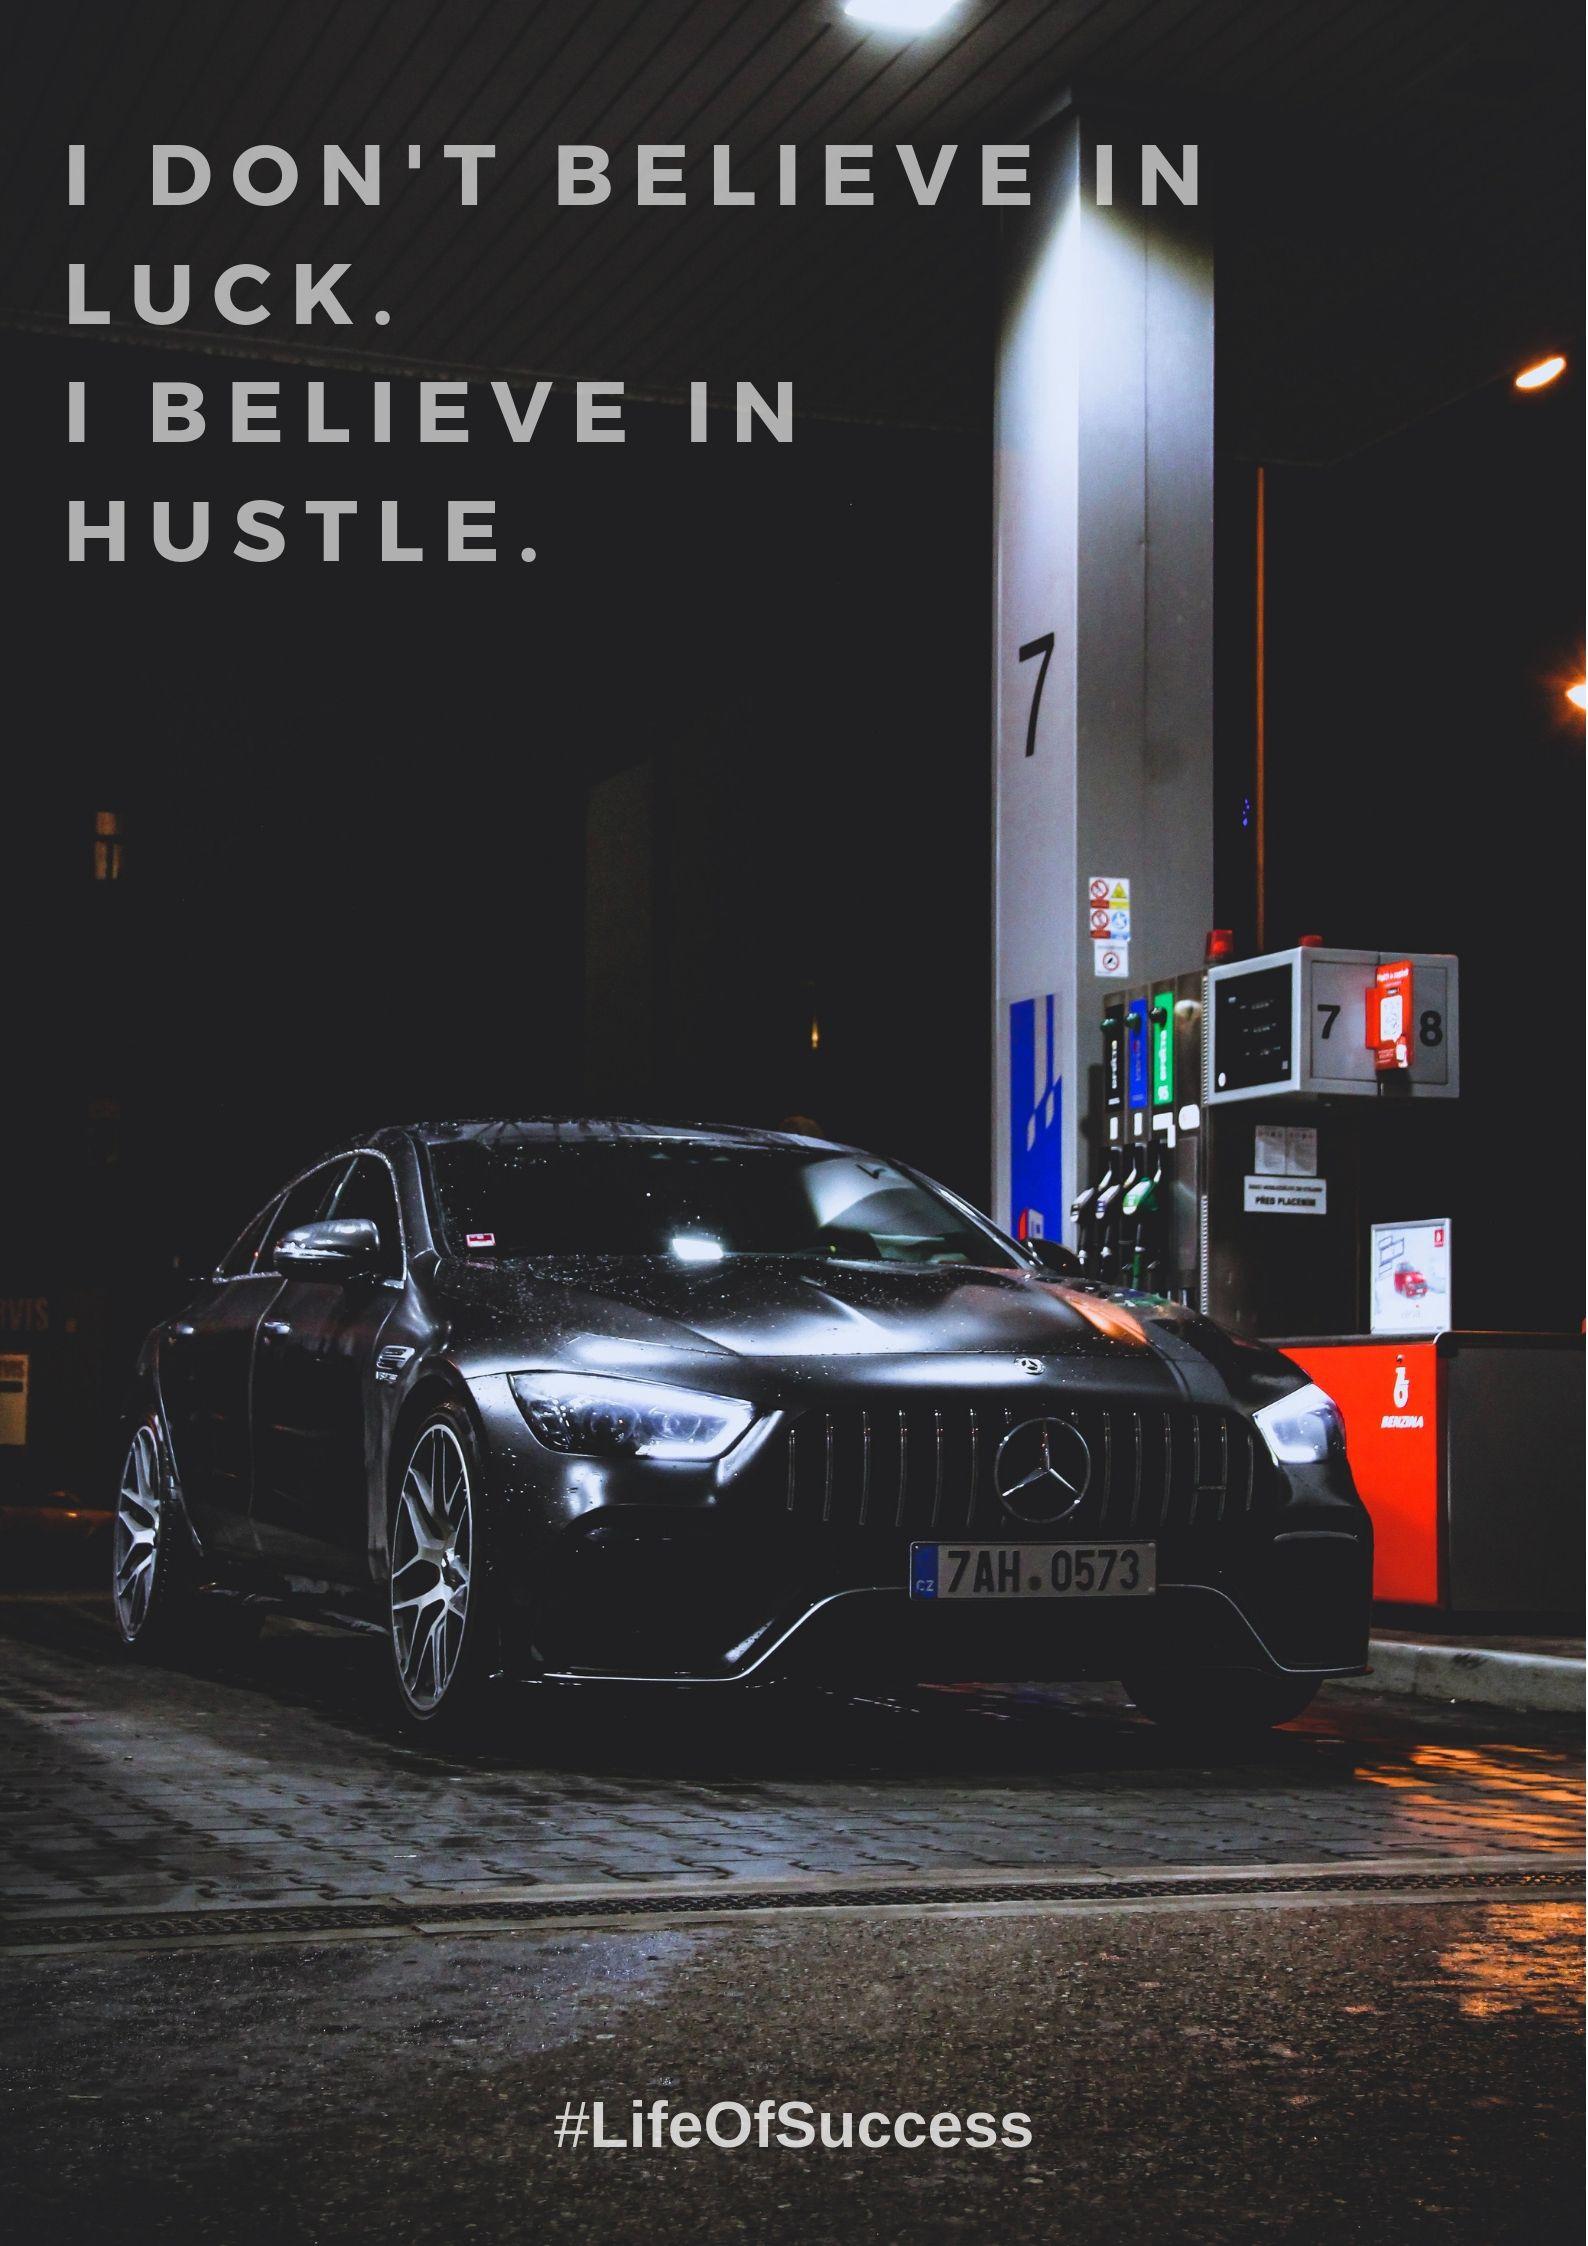 Life Quote Hustle Motivation Mercedes Benz Wallpaper Black